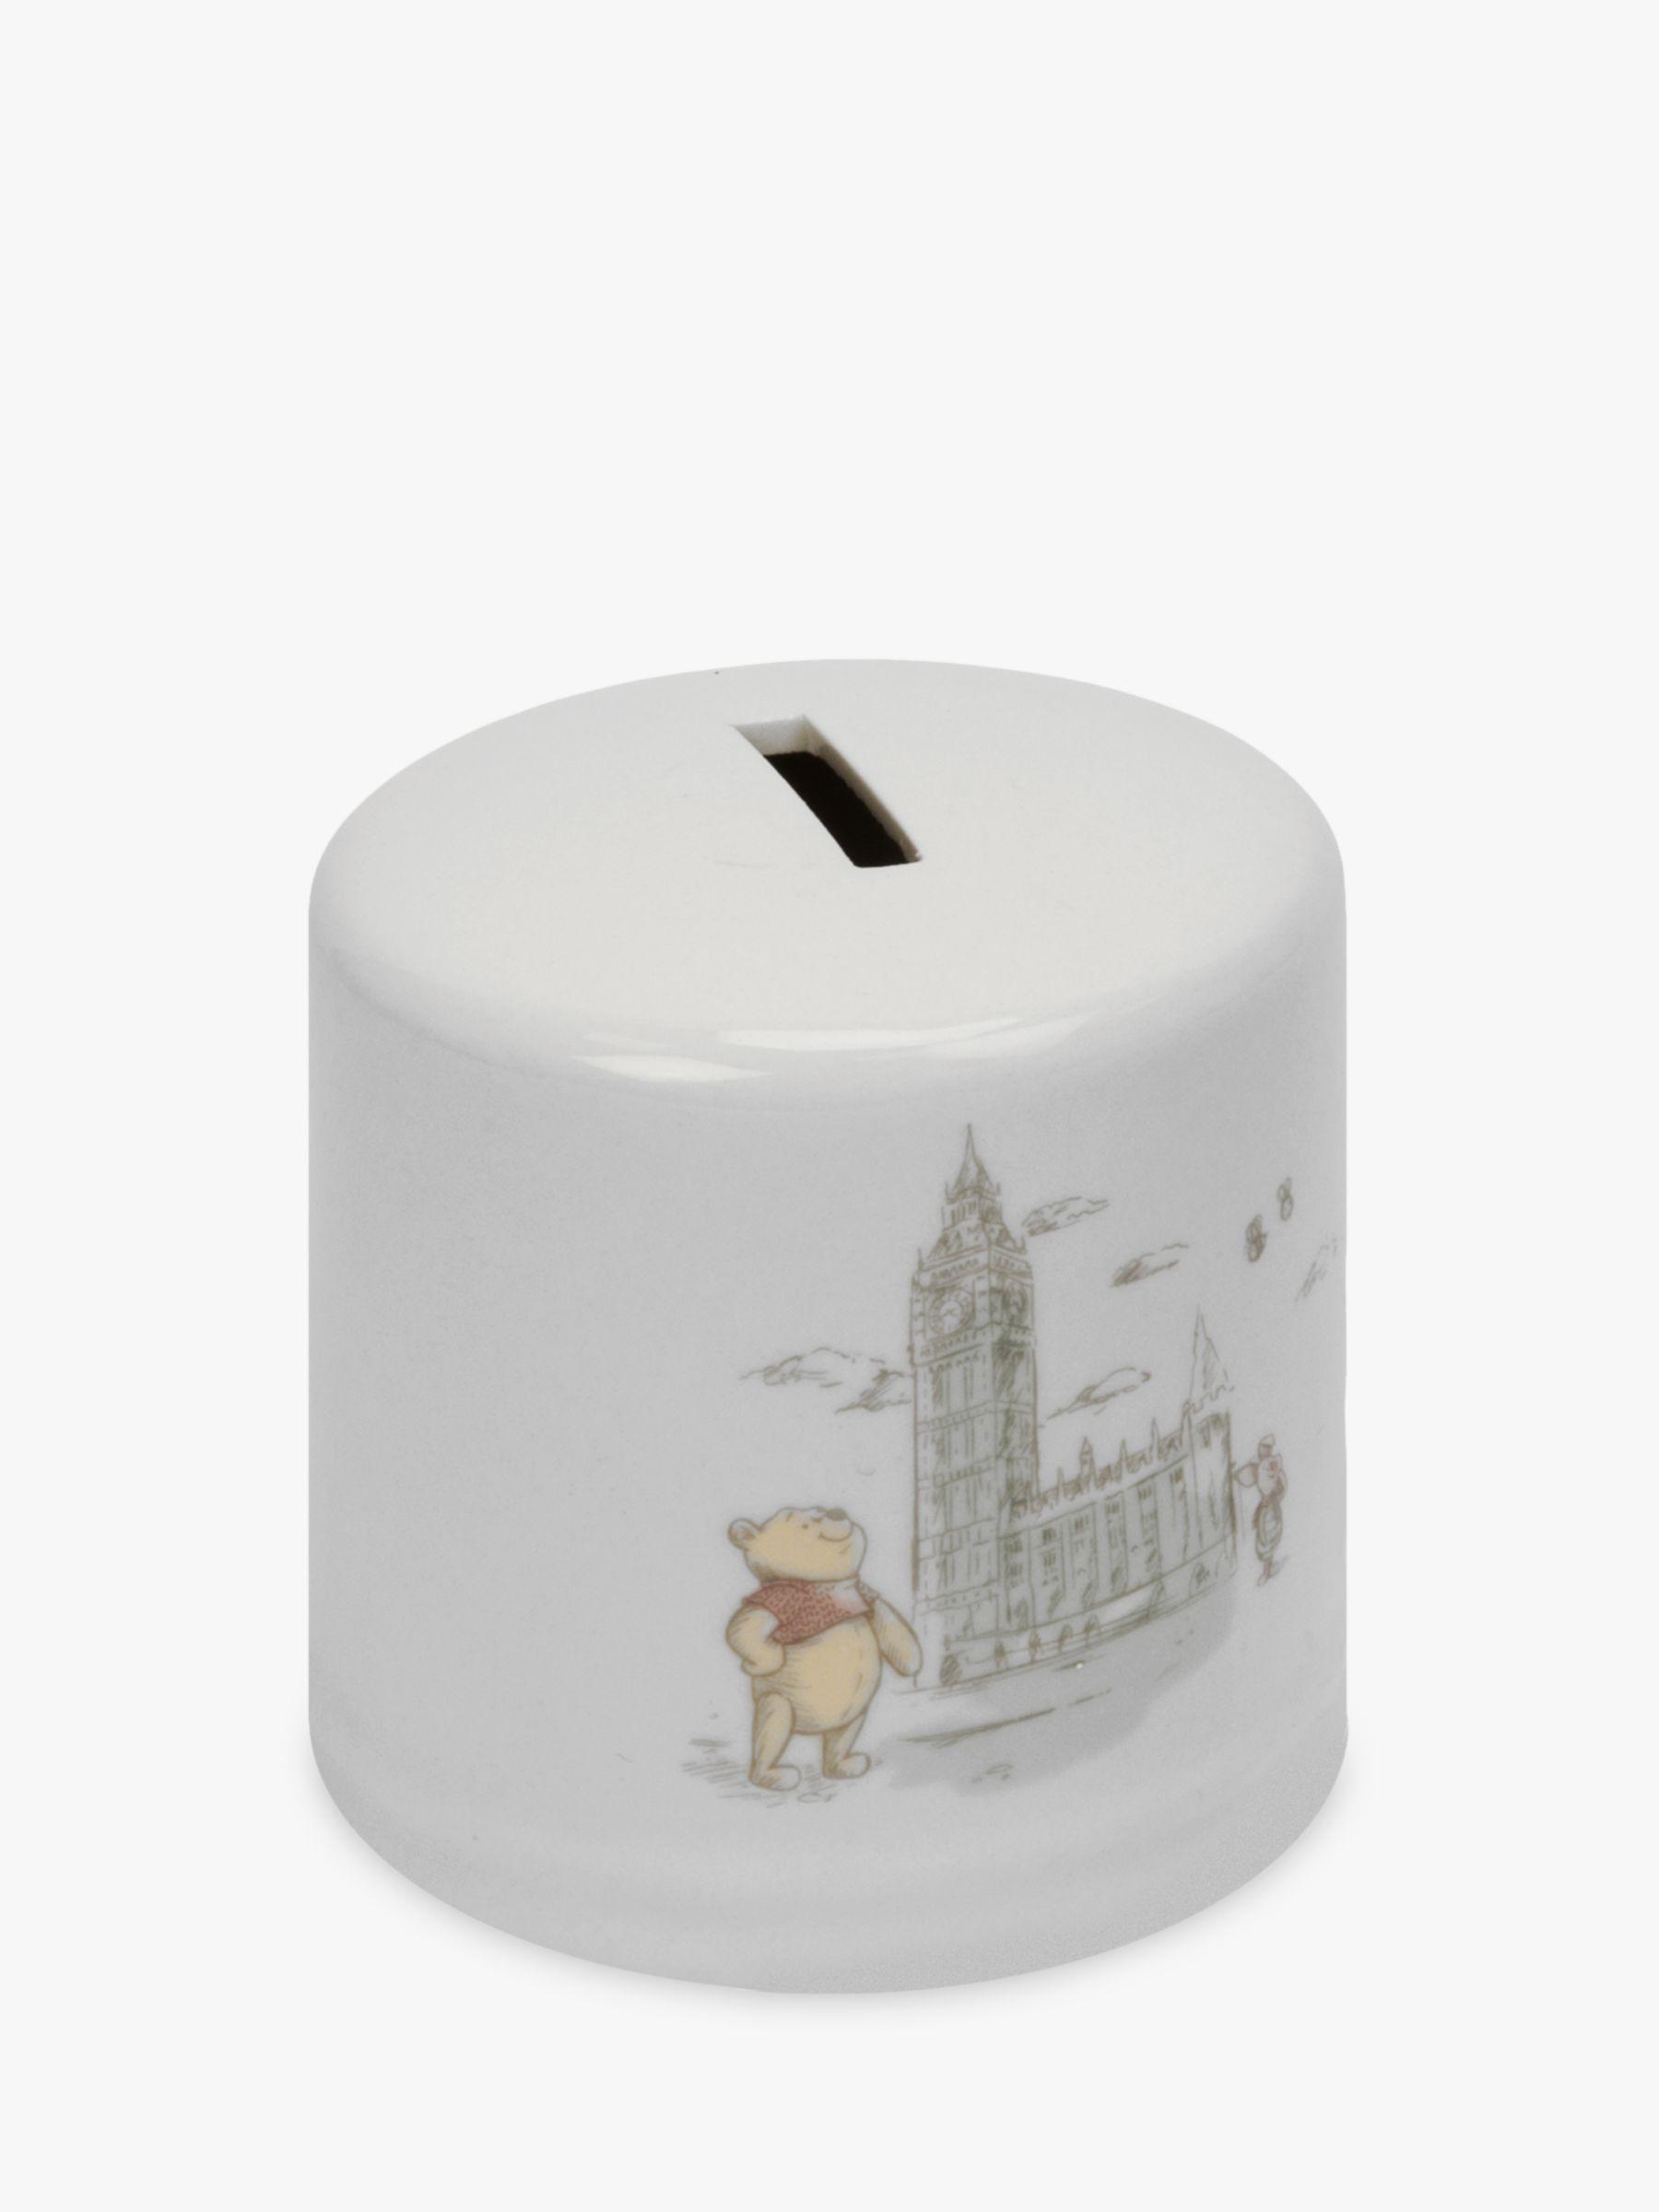 Winnie the pooh Winnie the Pooh Christopher Robin Money Box